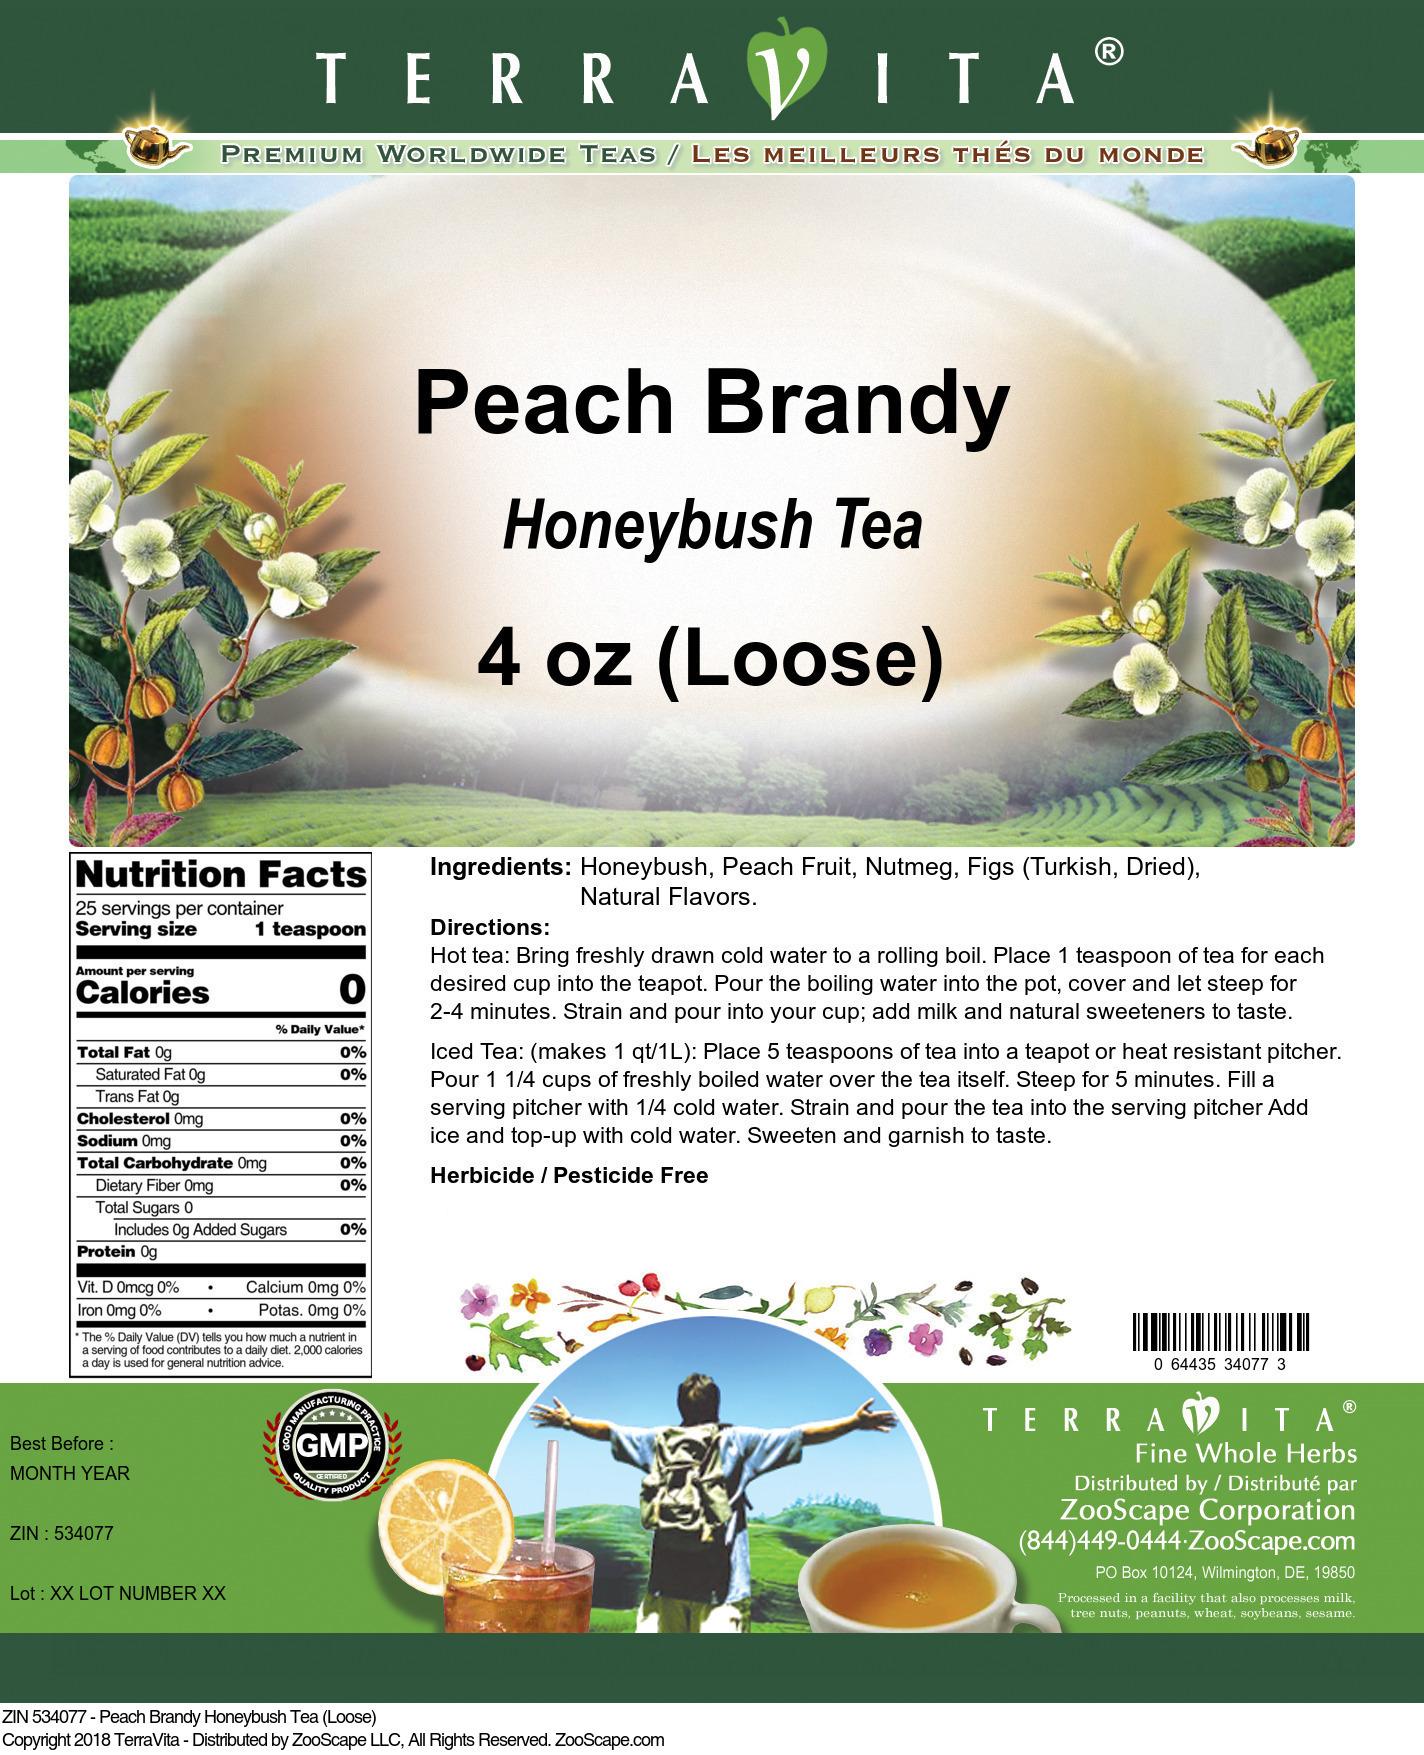 Peach Brandy Honeybush Tea (Loose)